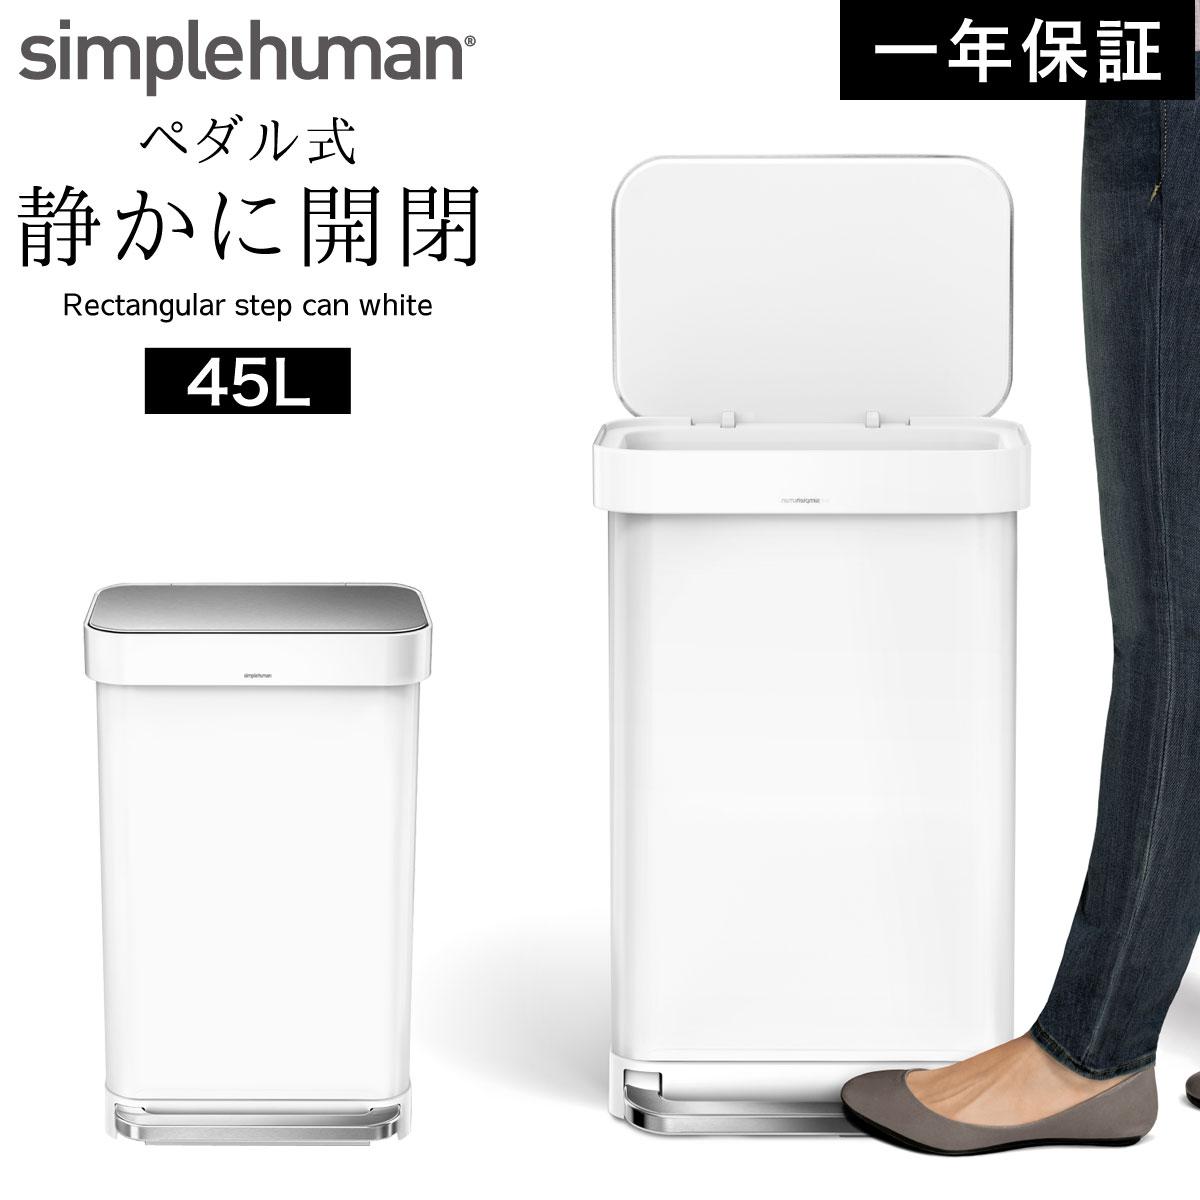 simplehuman シンプルヒューマン レクタンギュラーステップカン ホワイト 45L 00114 メーカー直送 返品不可